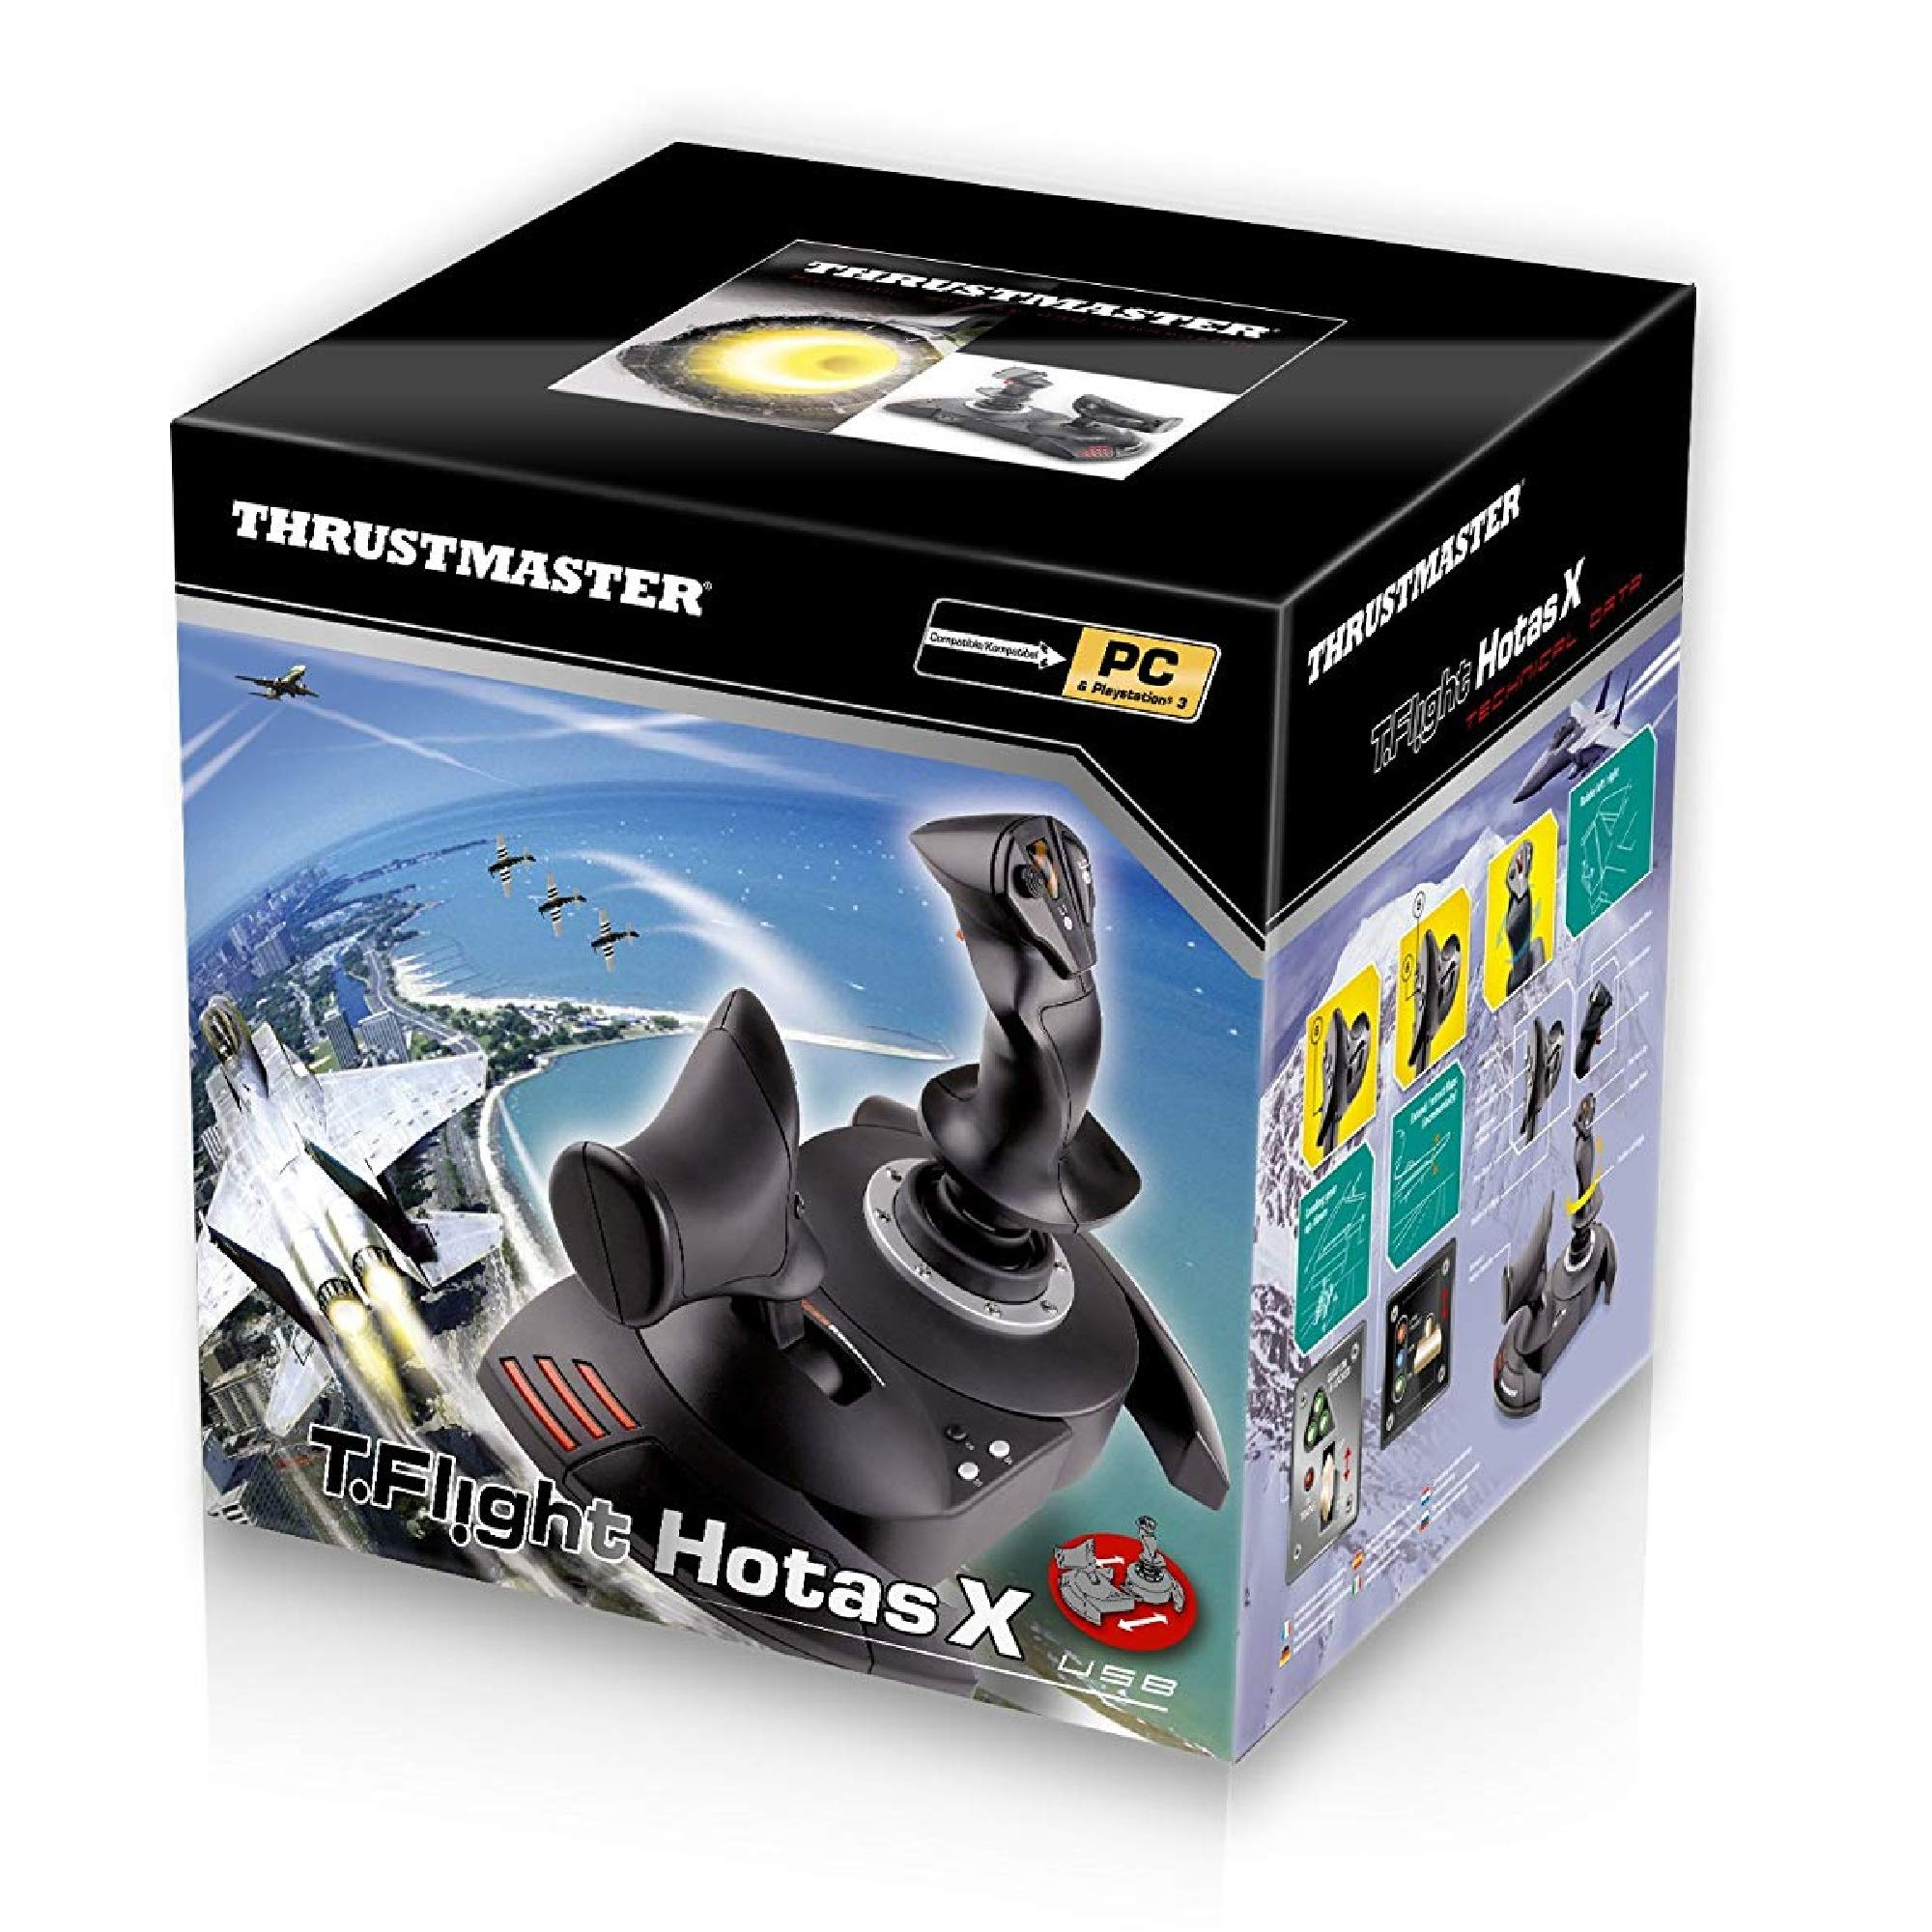 Thrustmaster T-Flight Hotas X Flight Stick by Thrustmaster (Image #5)